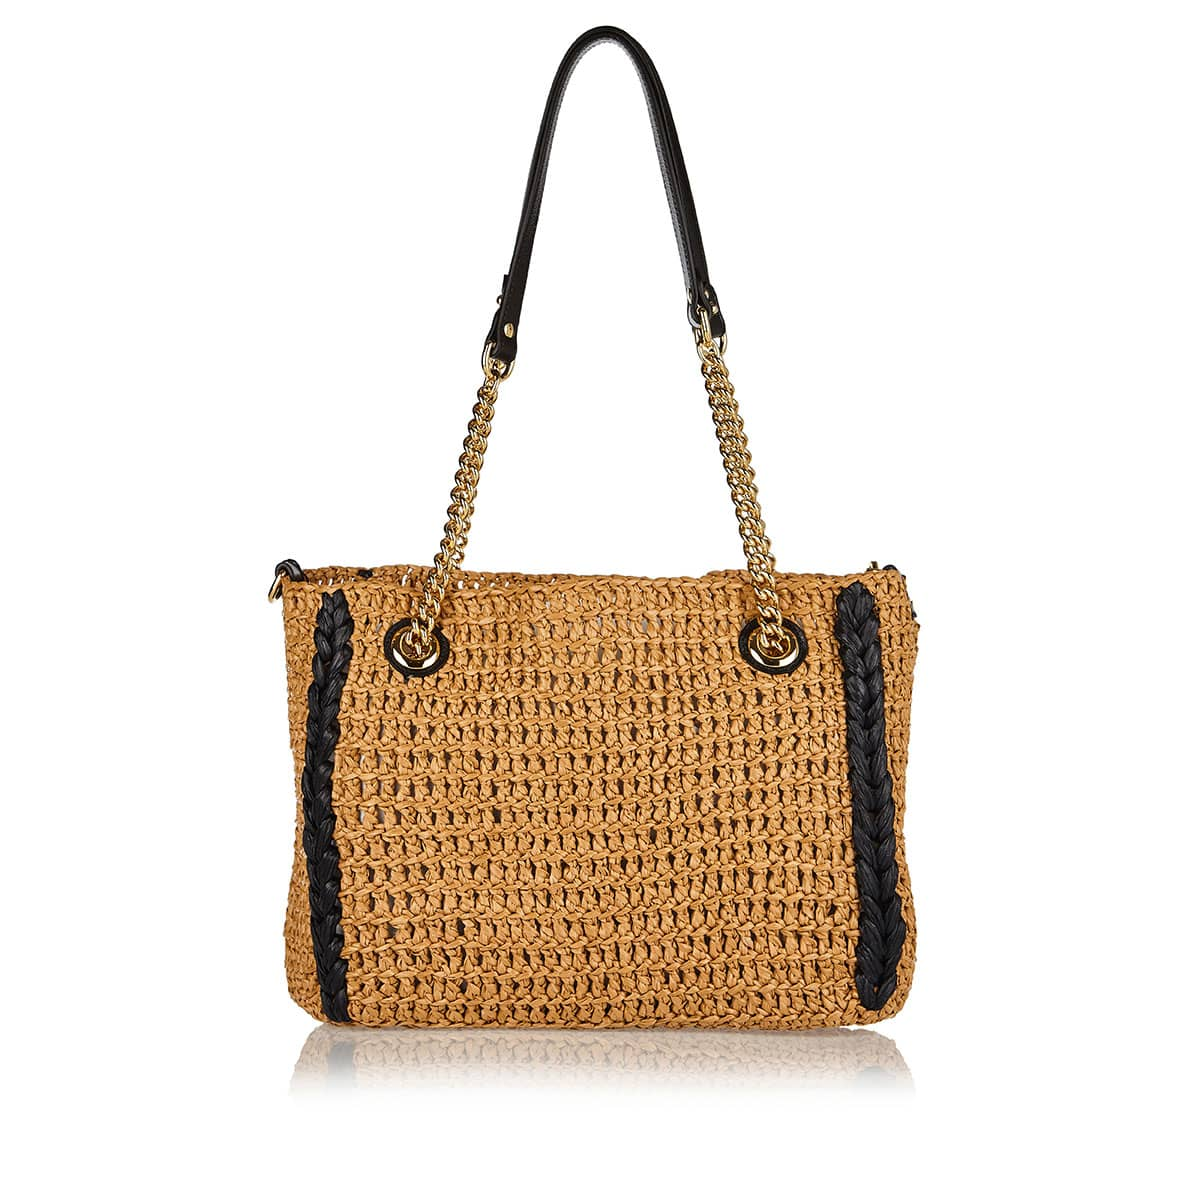 GG Marmont raffia-effect medium tote bag